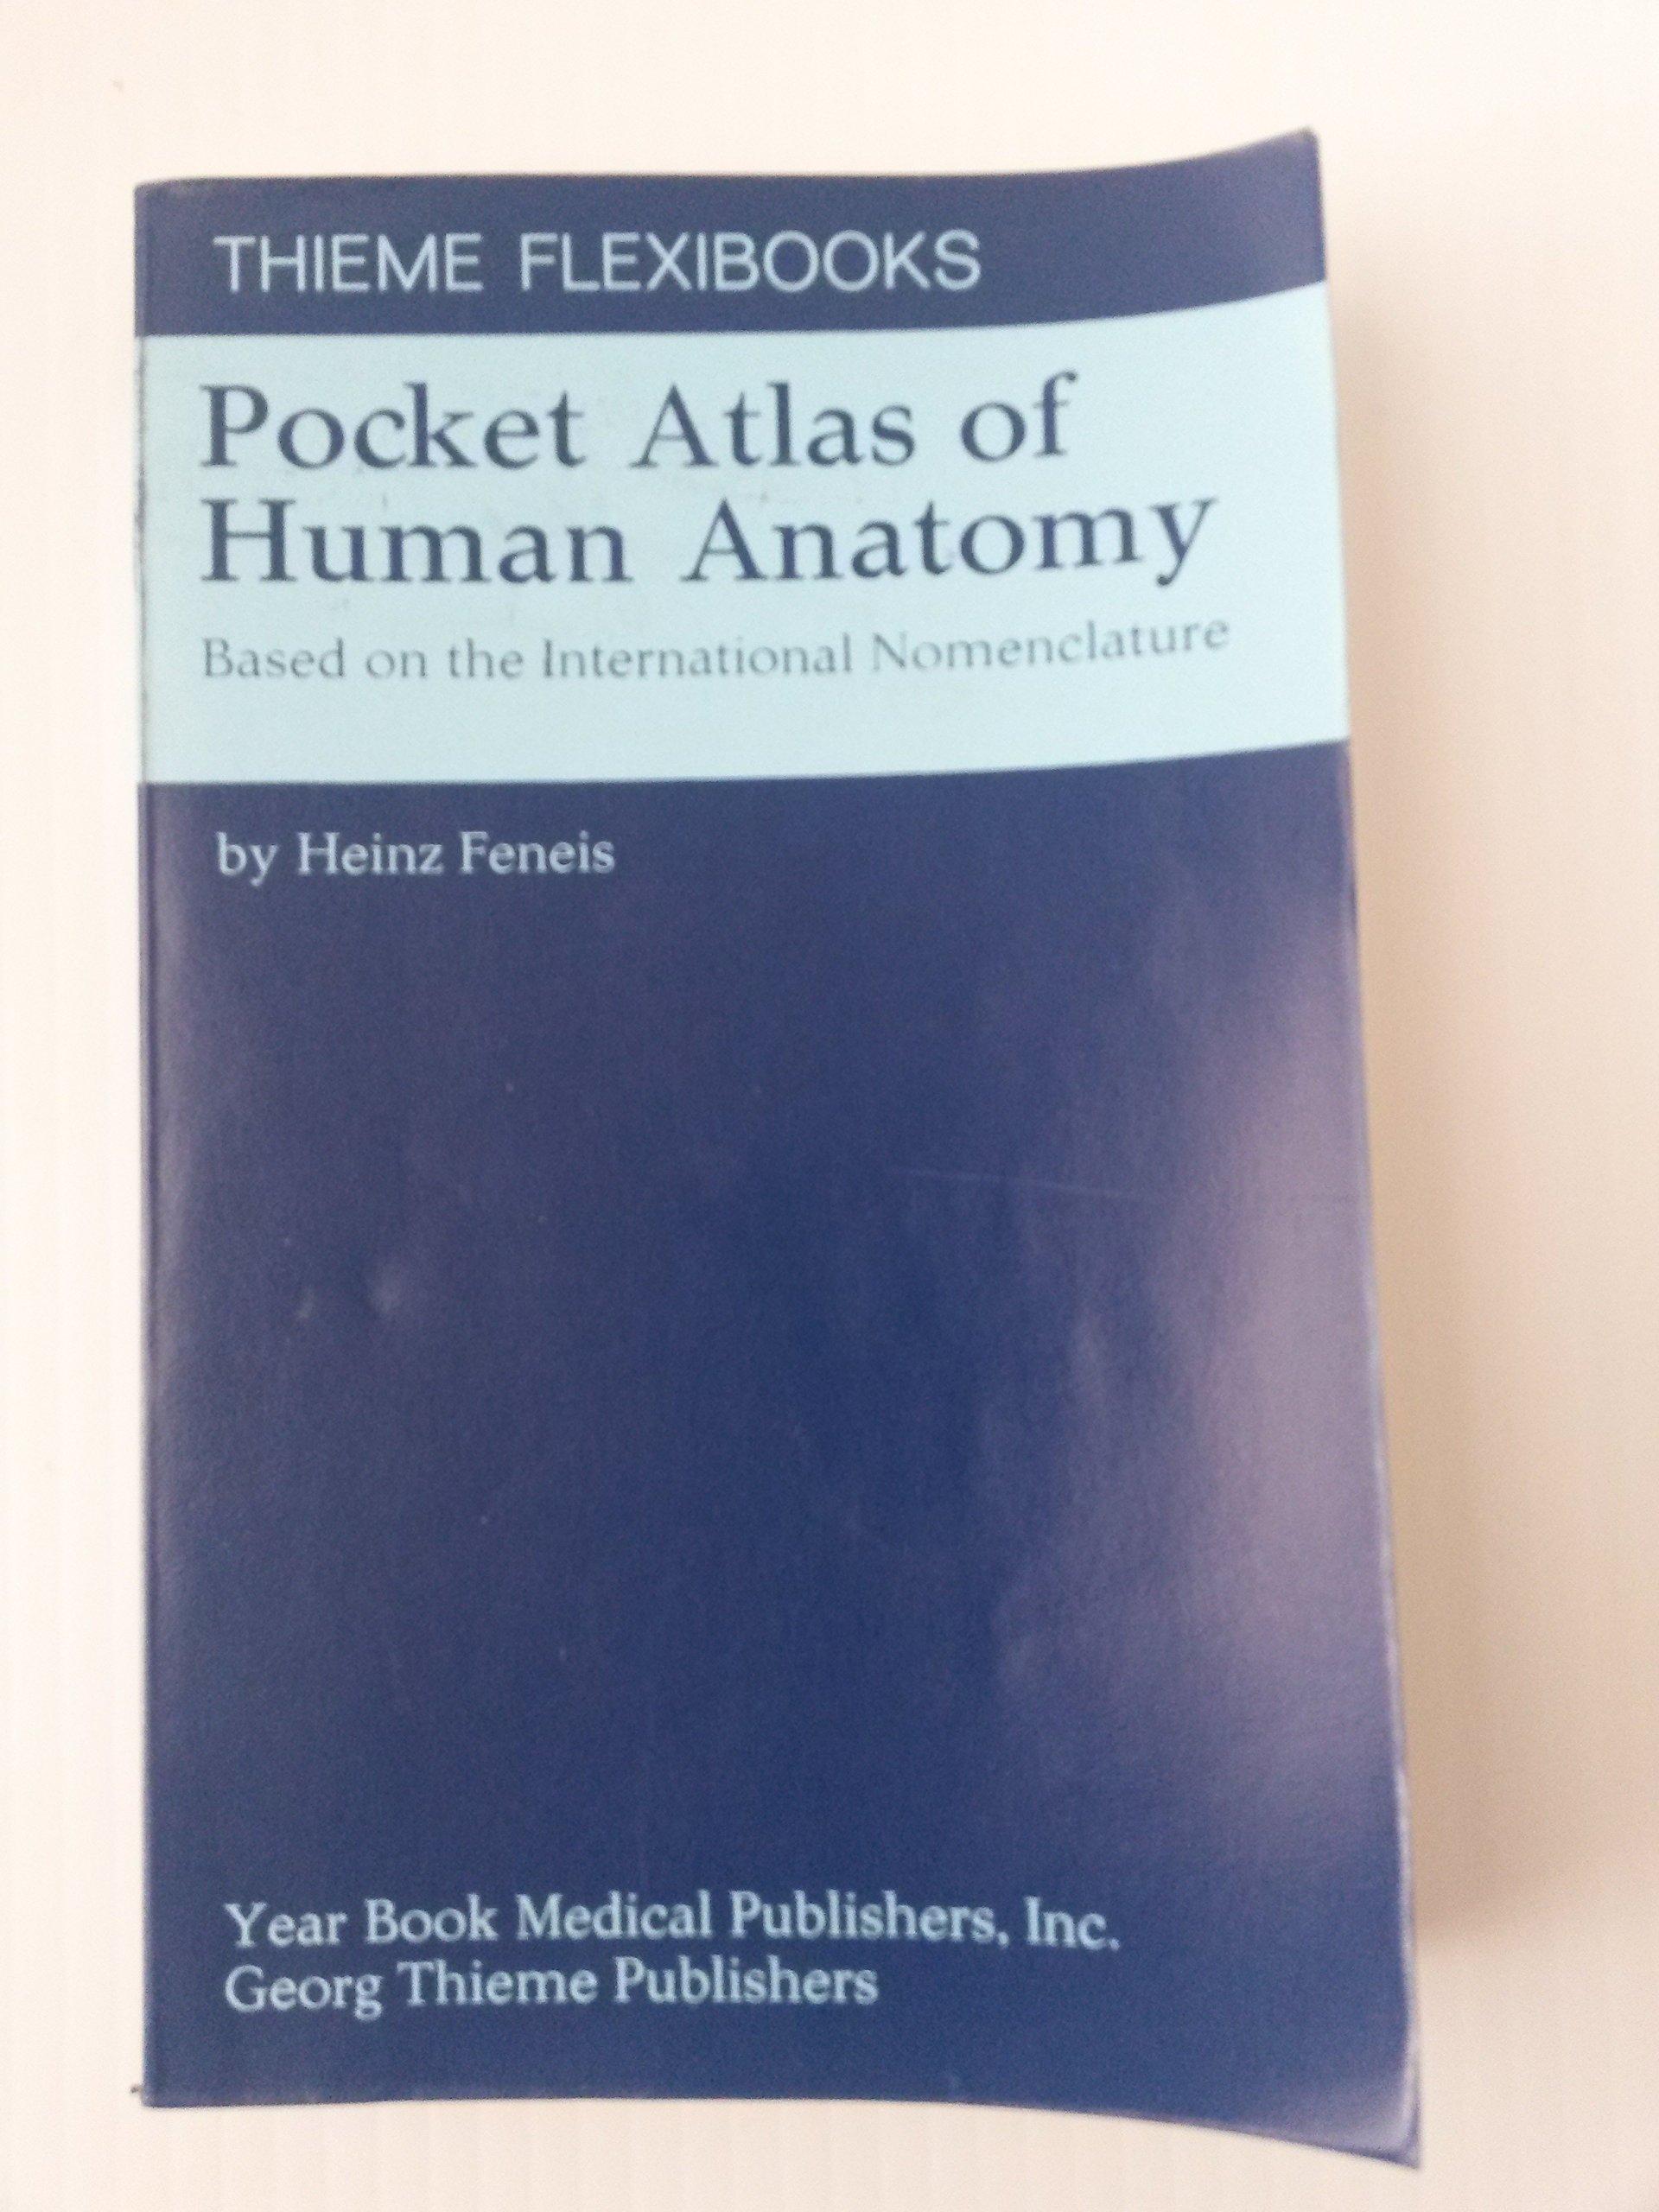 pocket-atlas-of-human-anatomy-based-on-the-international-nomenclature